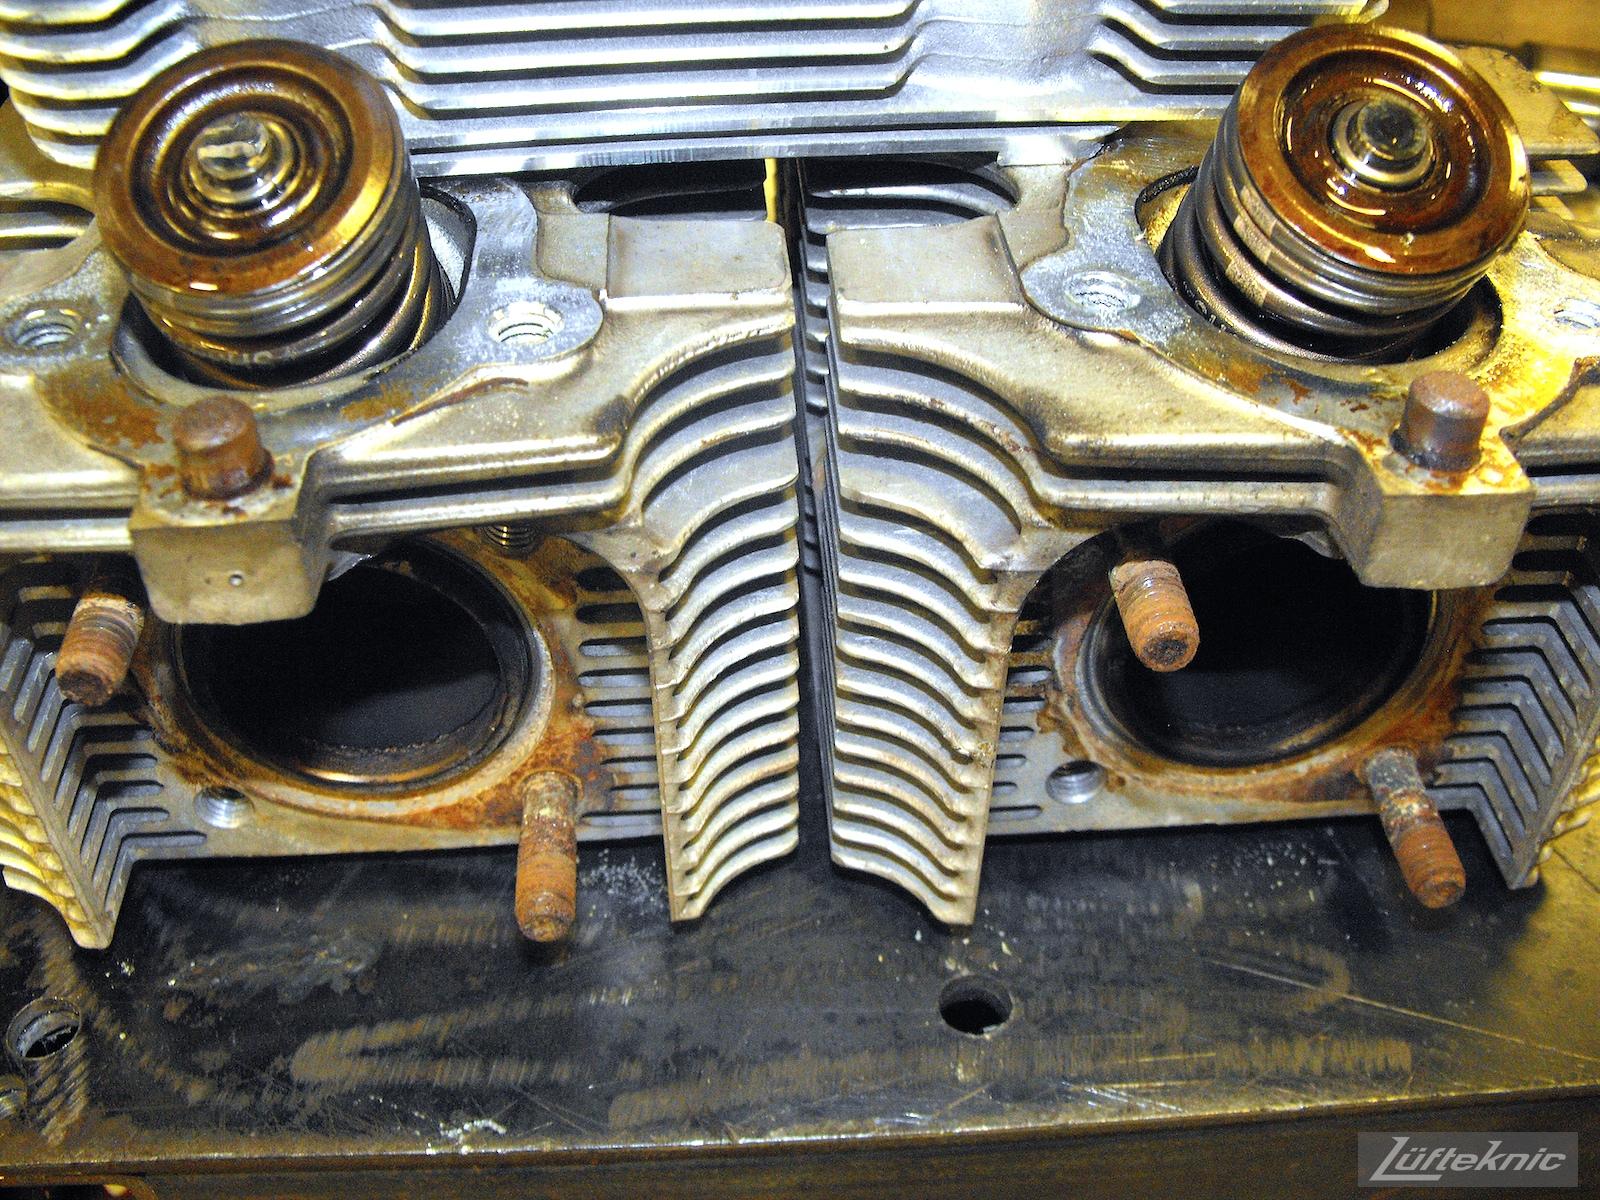 A 993 Turbo head prior to rebuilding.